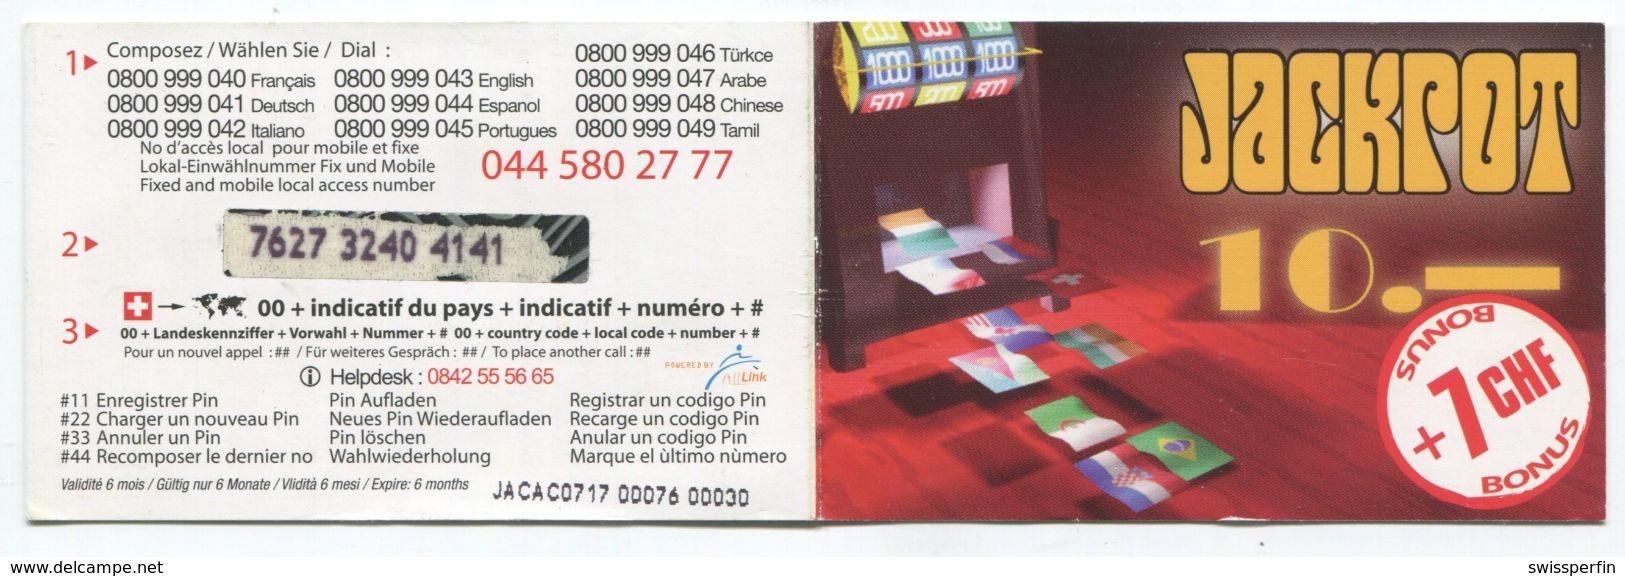 1678 - JACKPOT 10+7 CHF Prepaid Telefonkarte - Schweiz